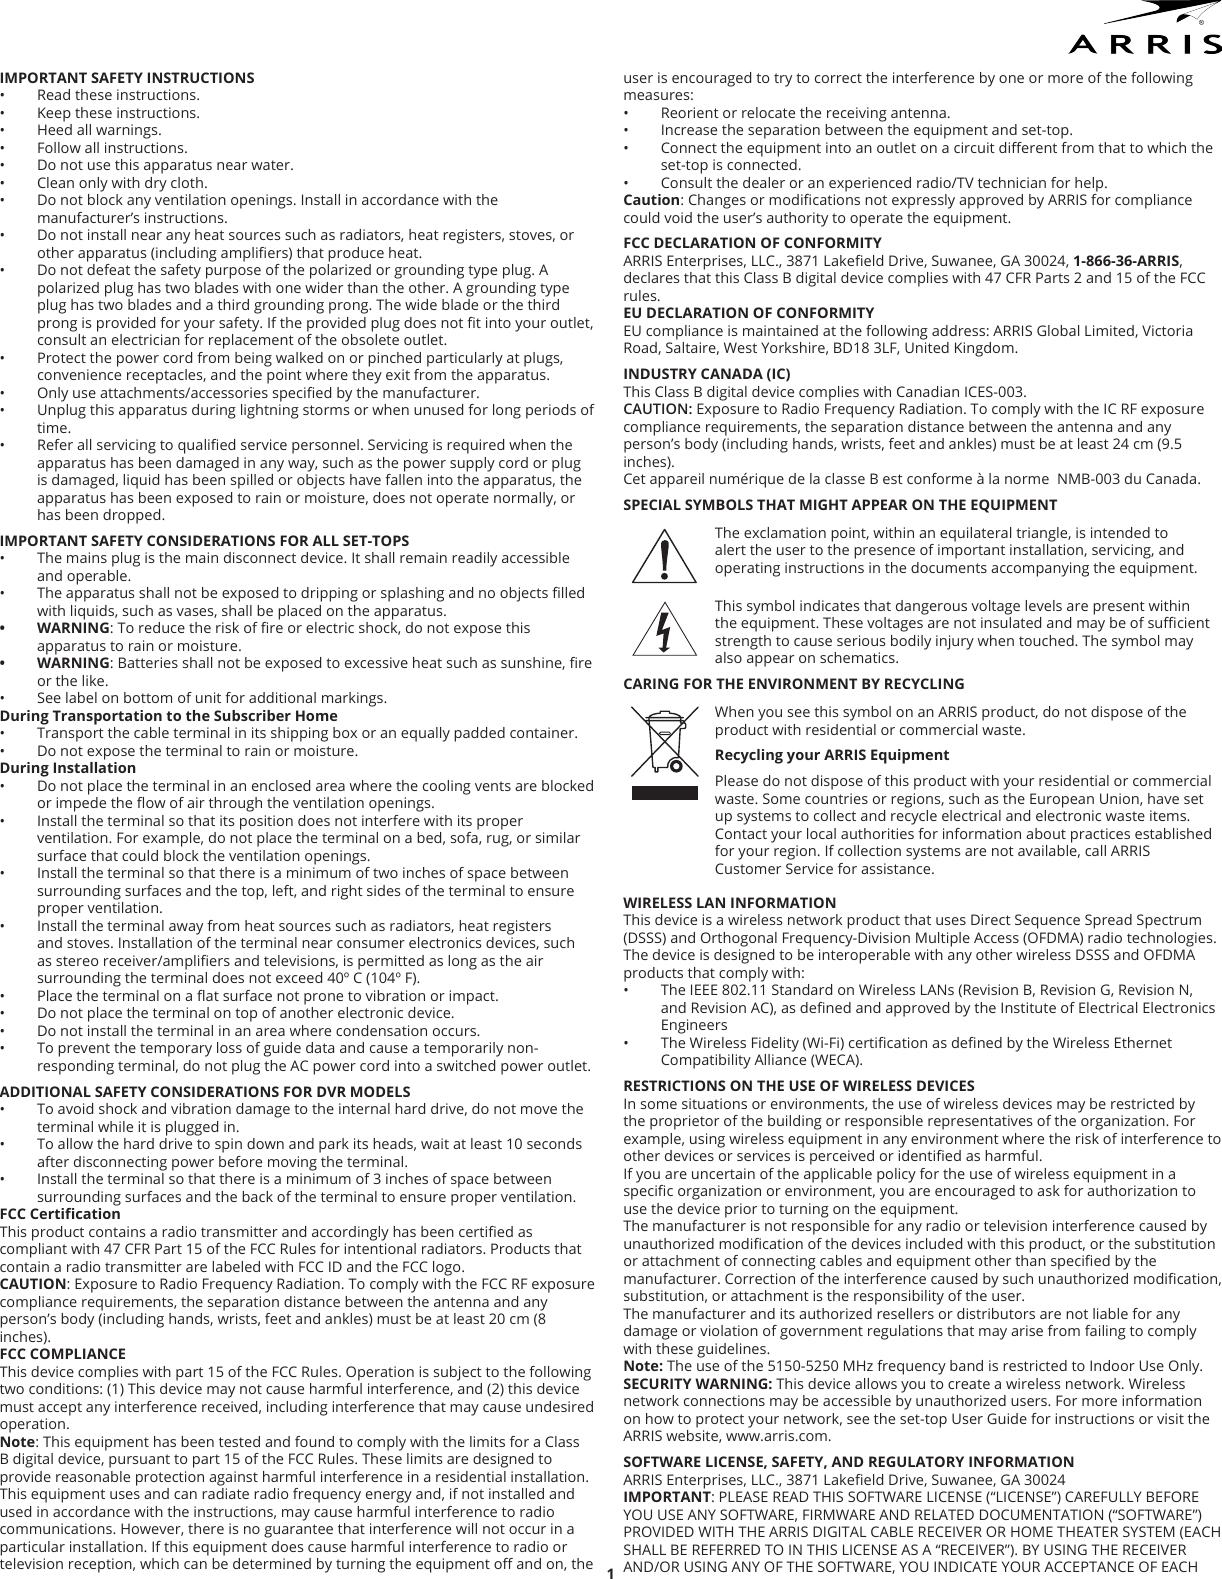 Arris Dcx860 Set Top Box User Manual Users Manual